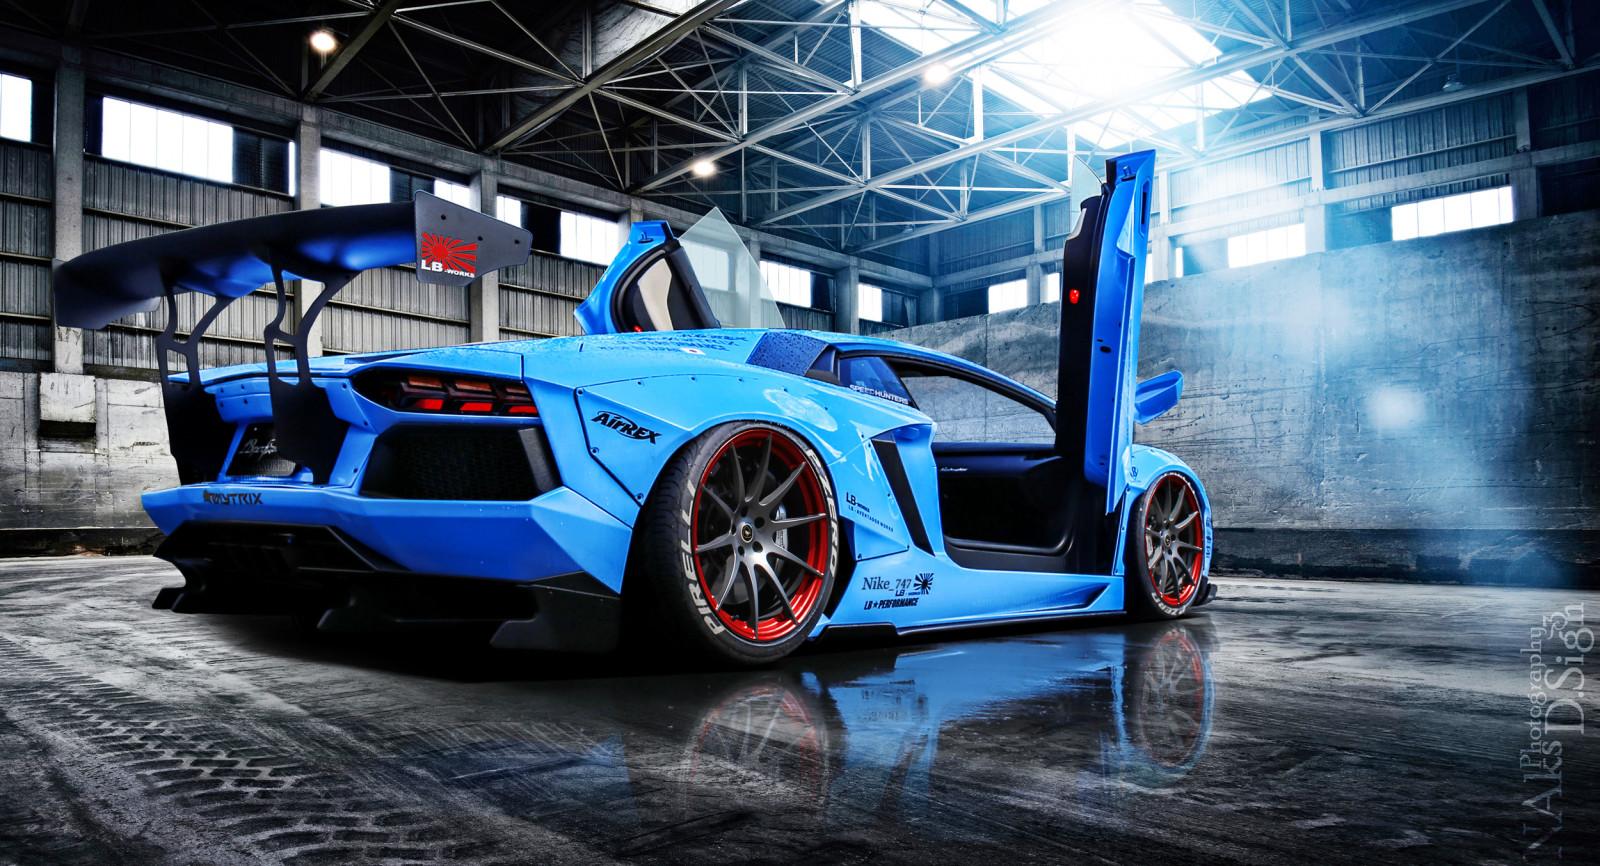 Superbe Wallpaper : White, Black, Sport, Italy, Water, Red, Reflection, Rain, Lamborghini  Aventador, Sun, Grey, Baby, Luxury, Japanese, Wheels, Sports Car, Tuning,  ...